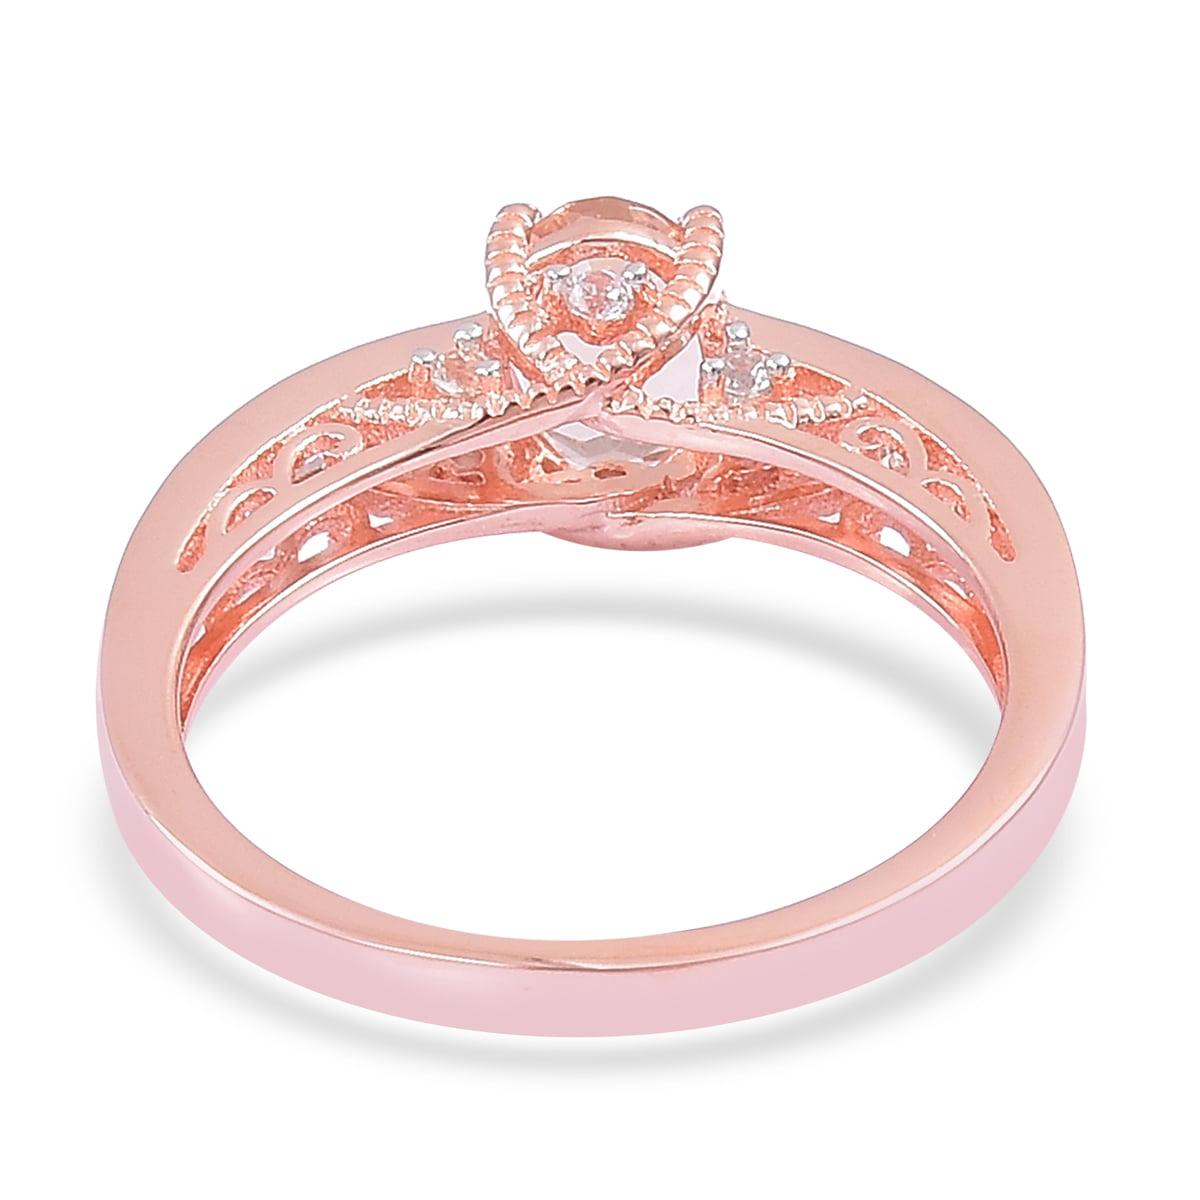 Morganite, White Topaz 14K Rose Gold Plated Silver Ring 1.6 cttw ...